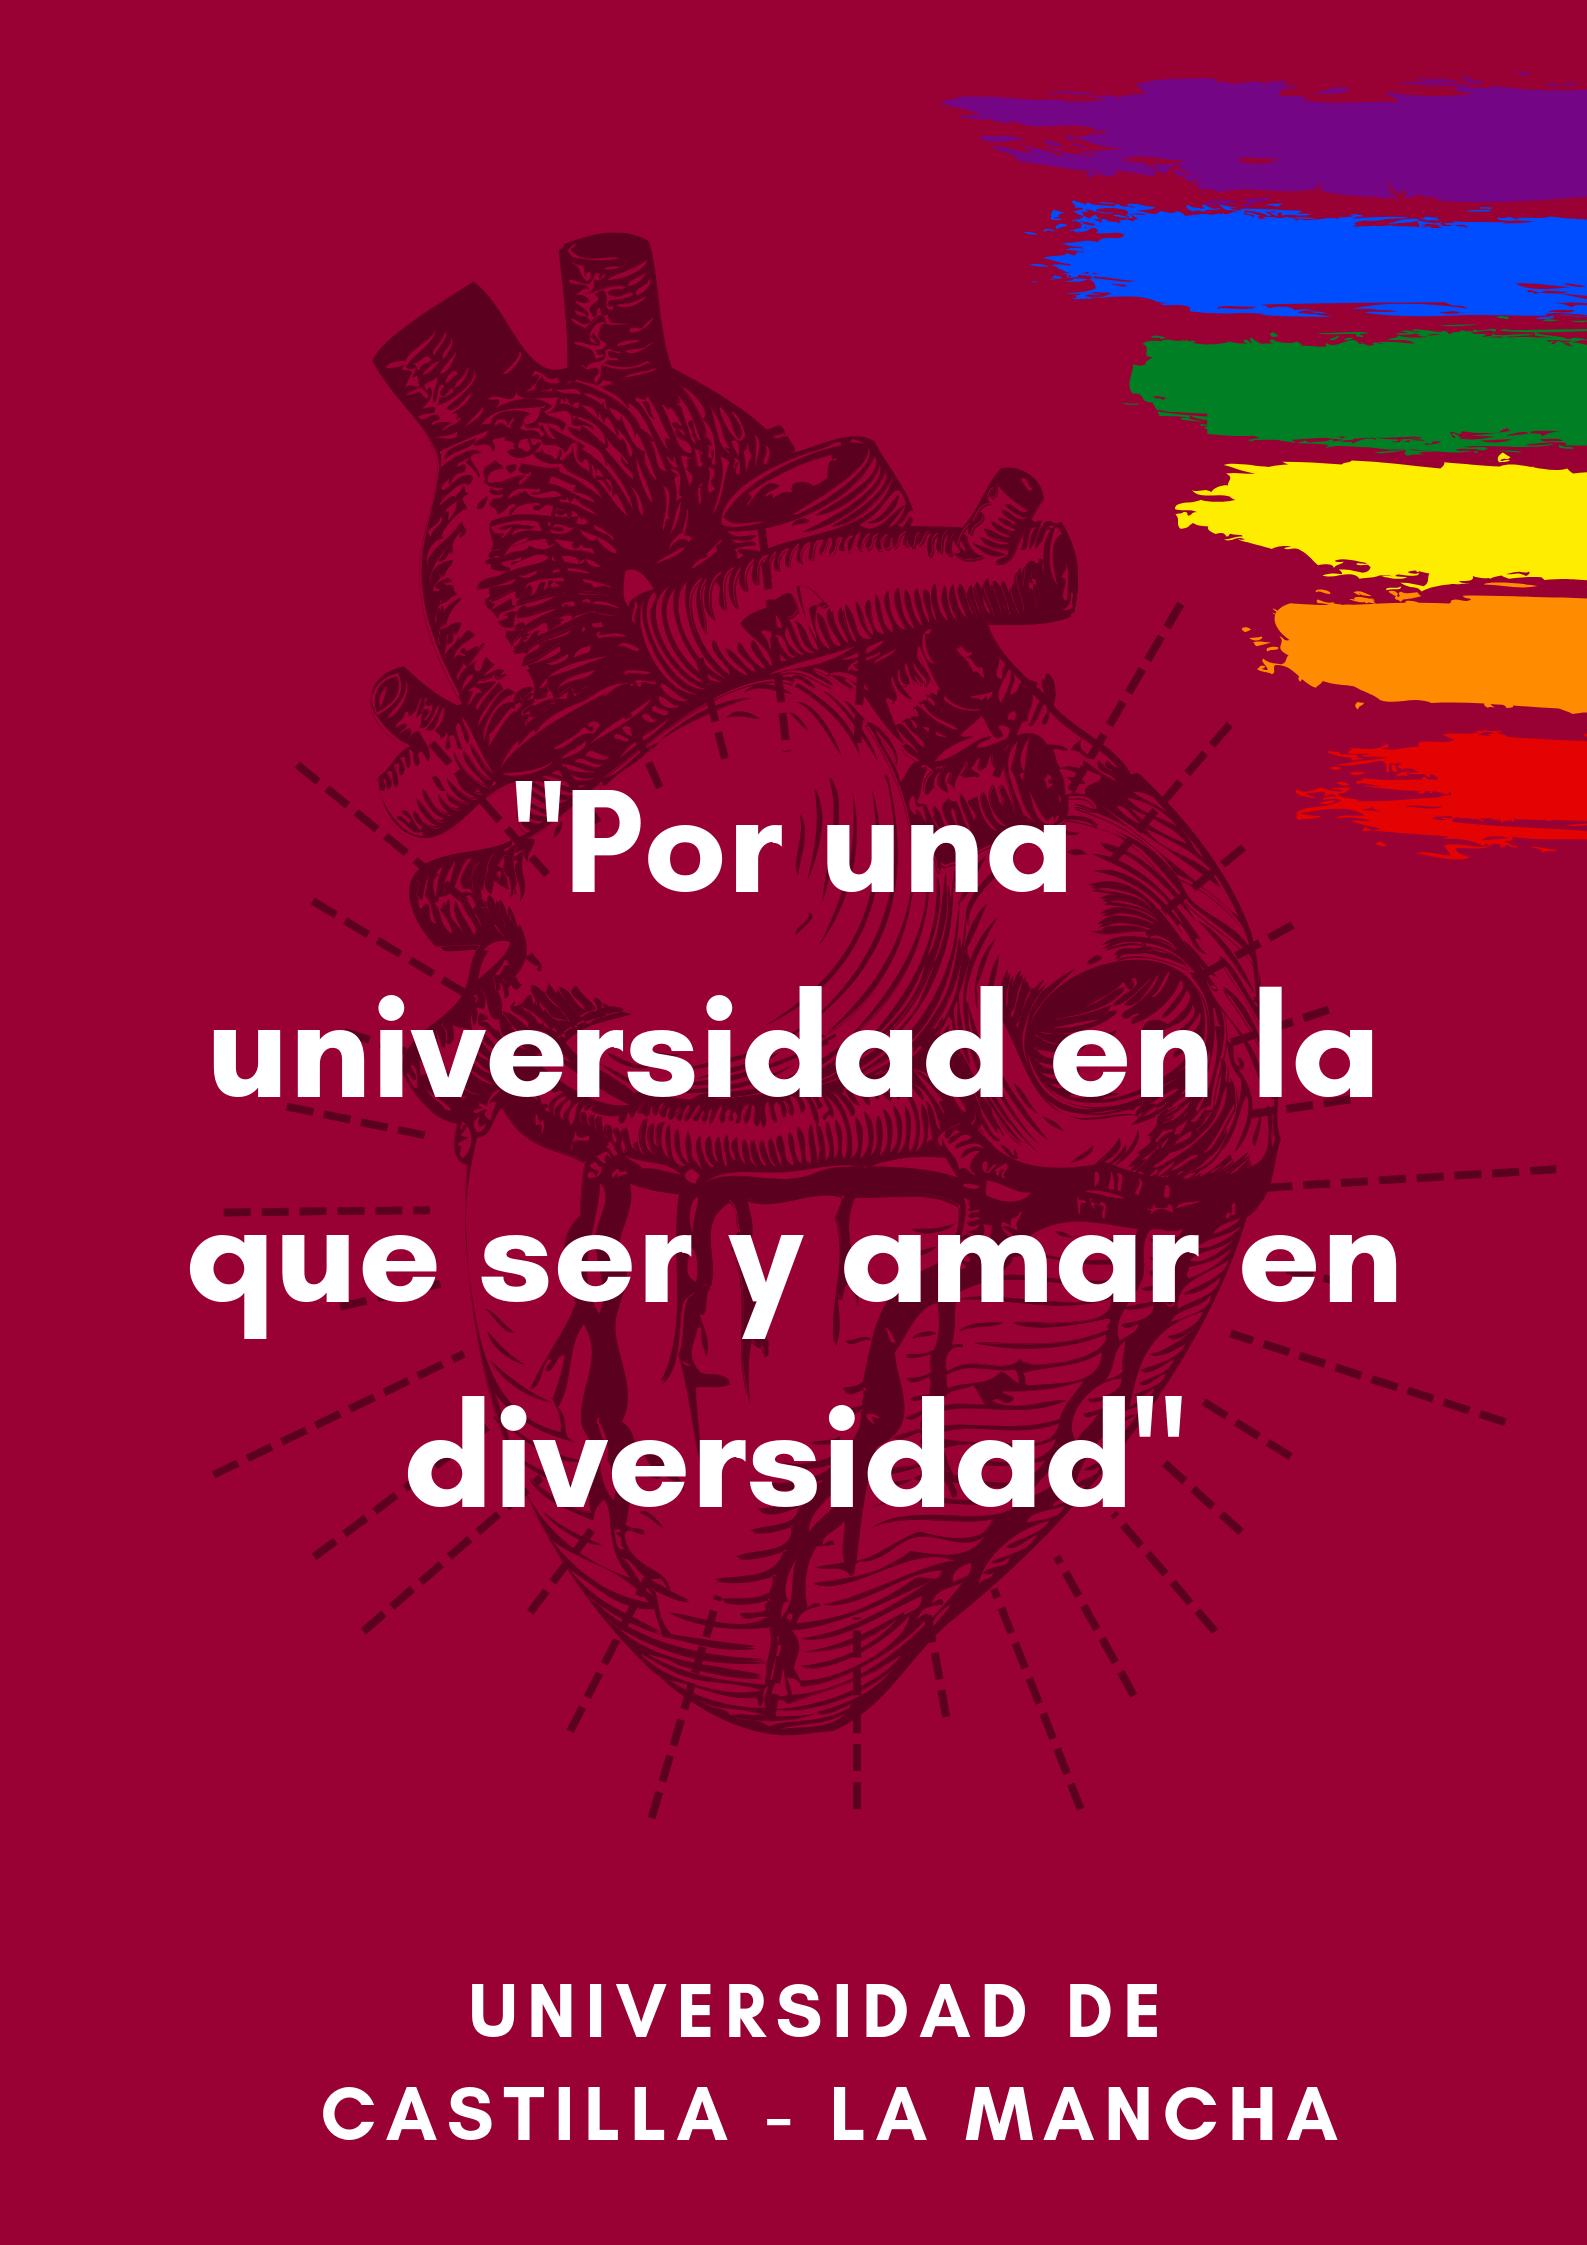 La UCLM en Talavera de la Reina se suma a conmemorar el Orgullo LGTB